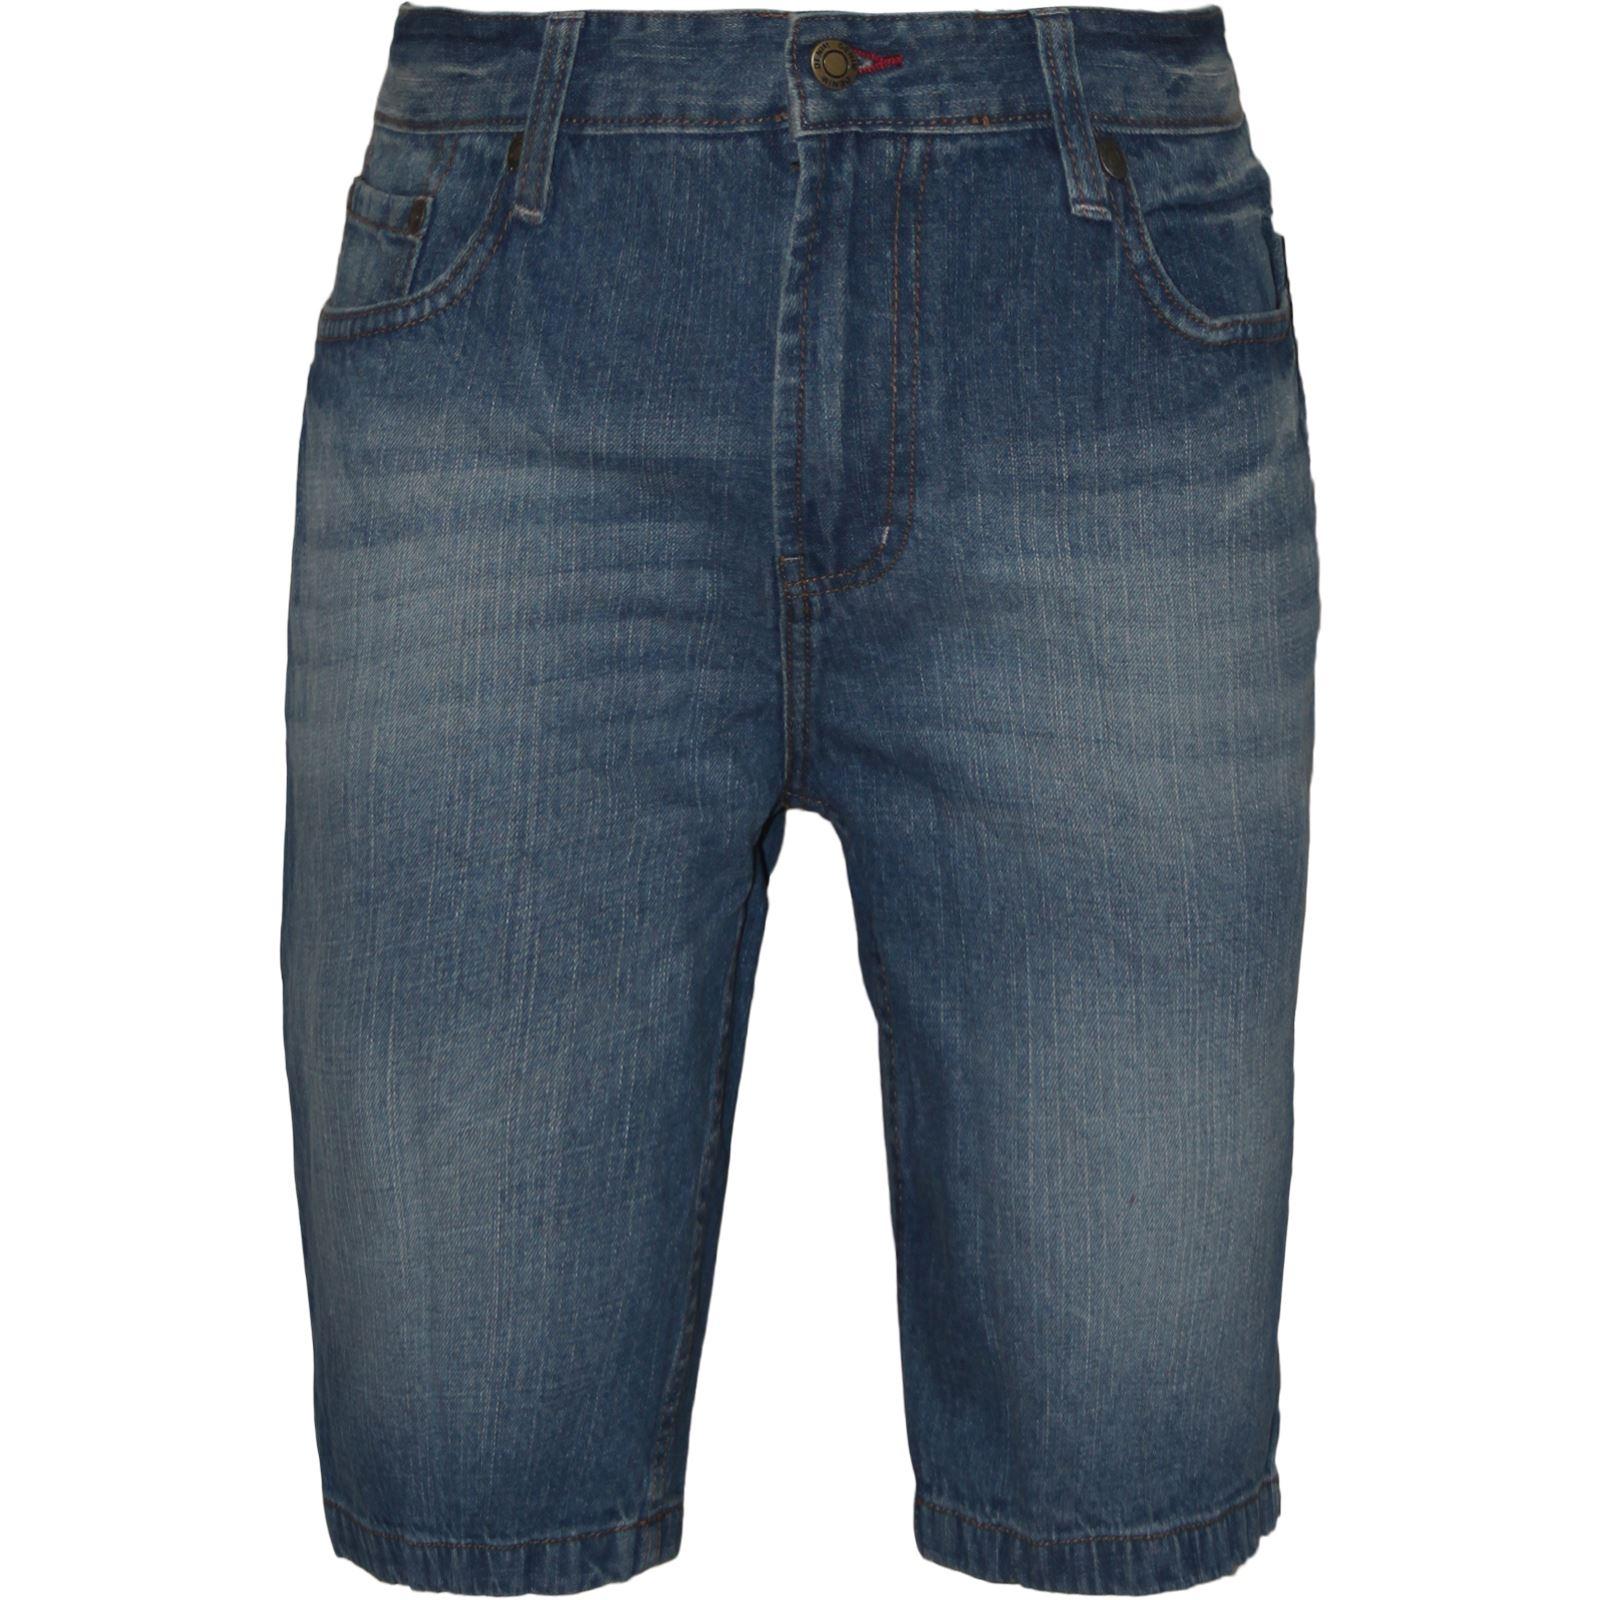 mens denim jeans shorts wash cargo combat casual knee length pants 30 38 ebay. Black Bedroom Furniture Sets. Home Design Ideas